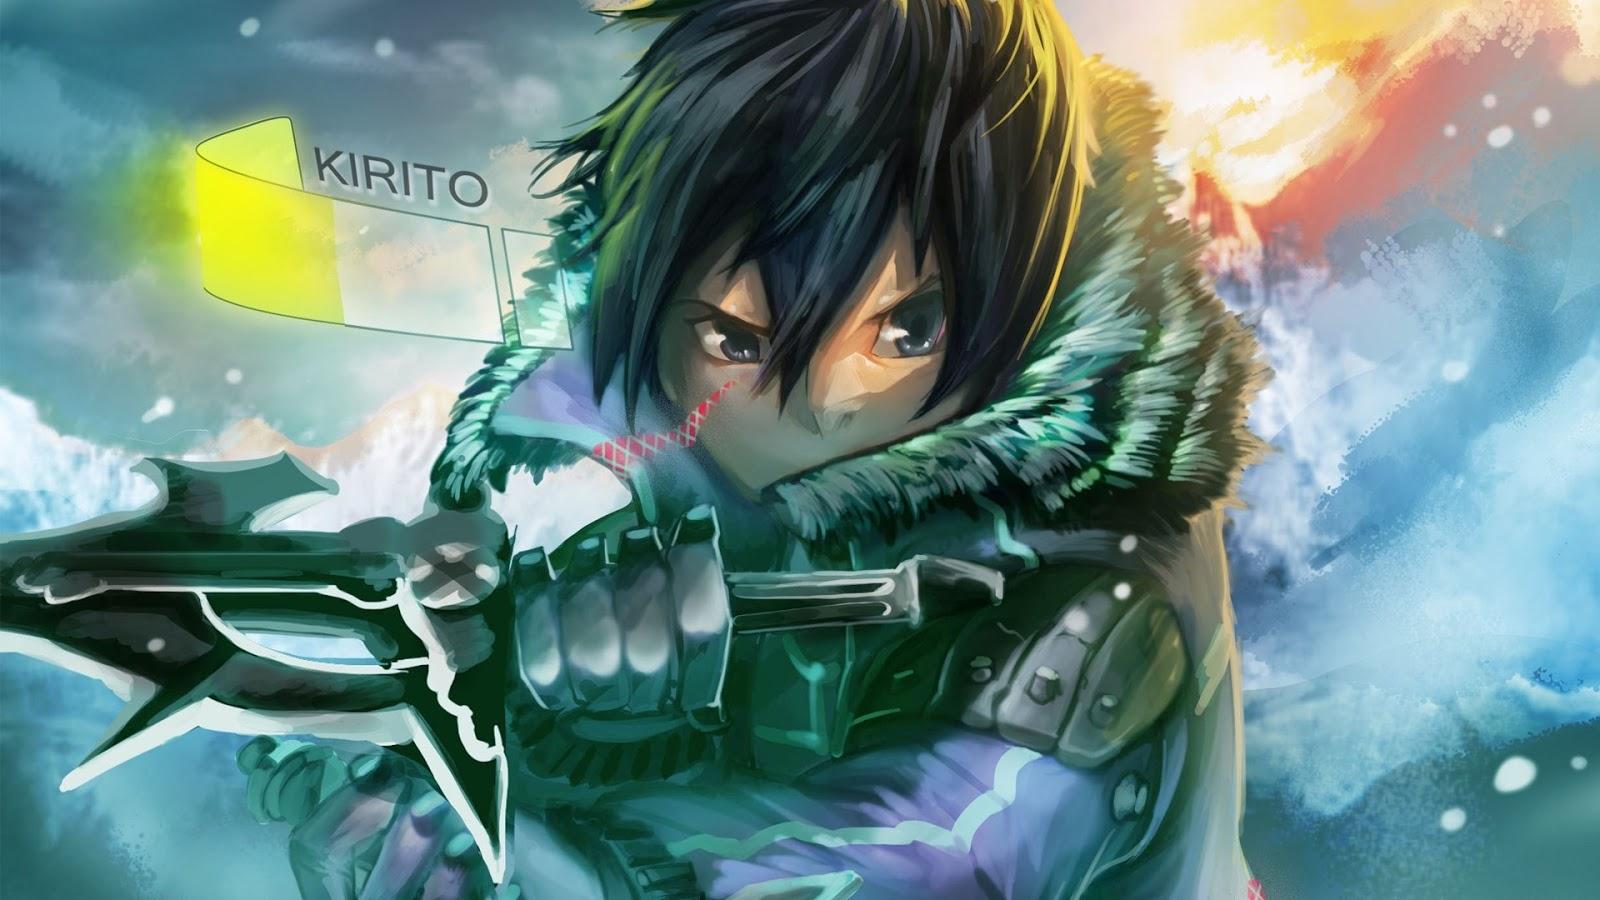 Wallpaper Sword Art Online HD